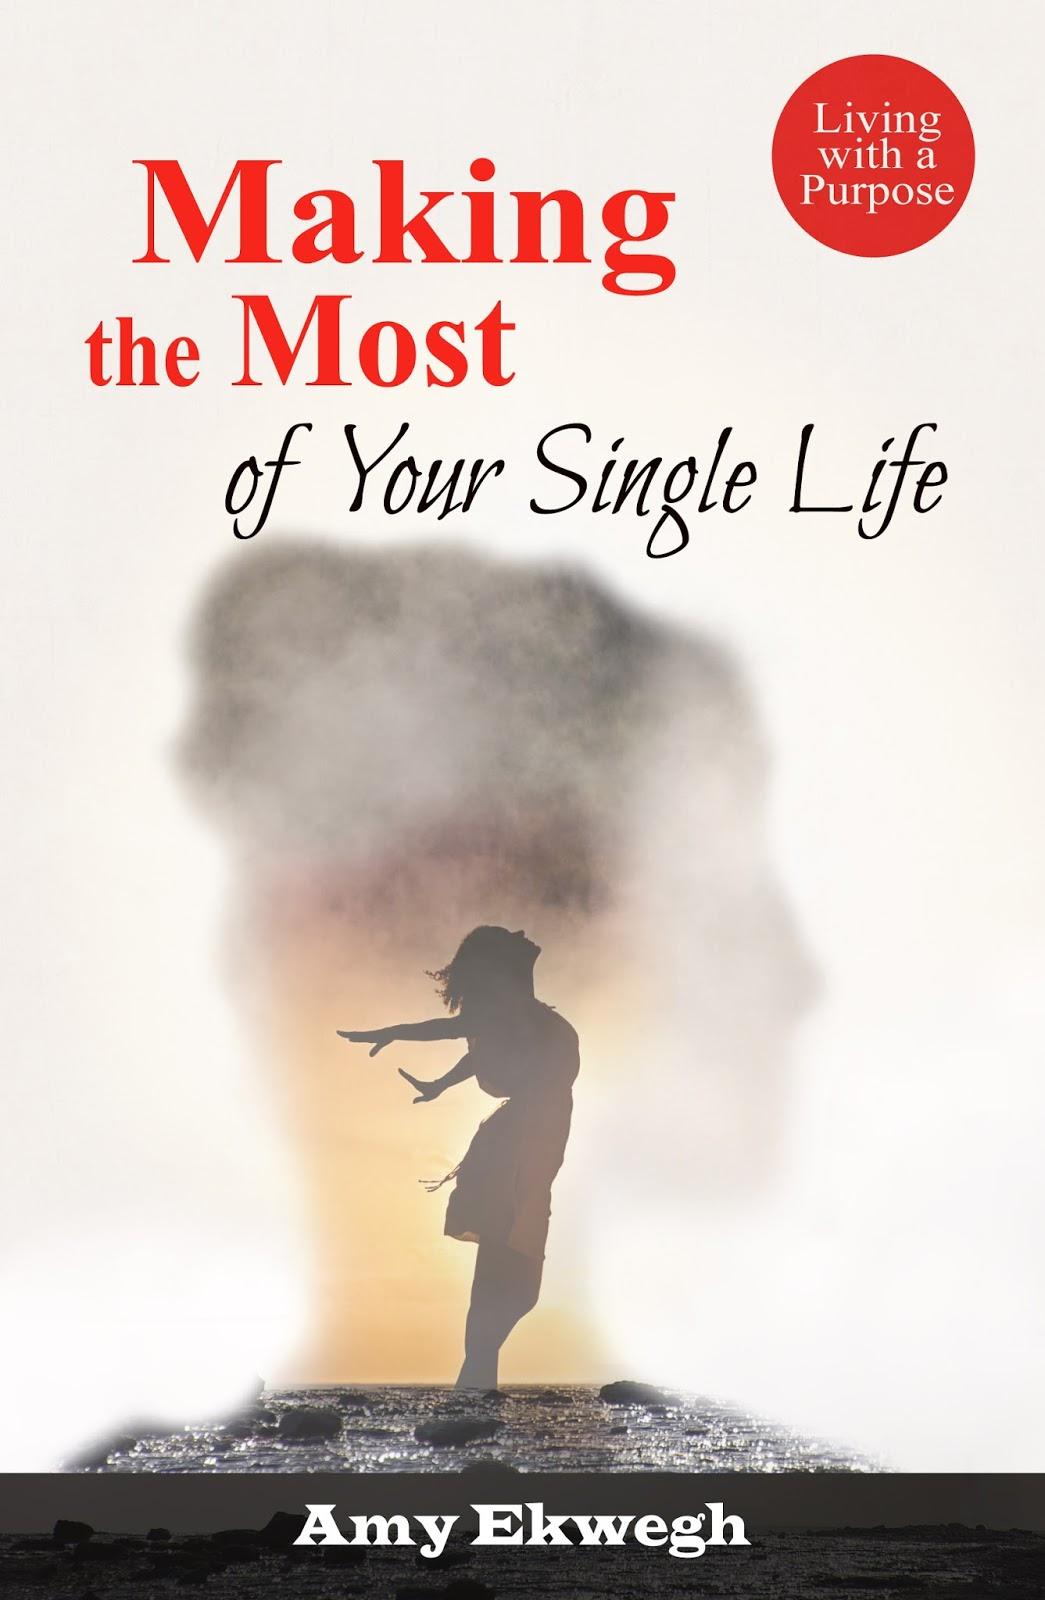 Living a happy single life